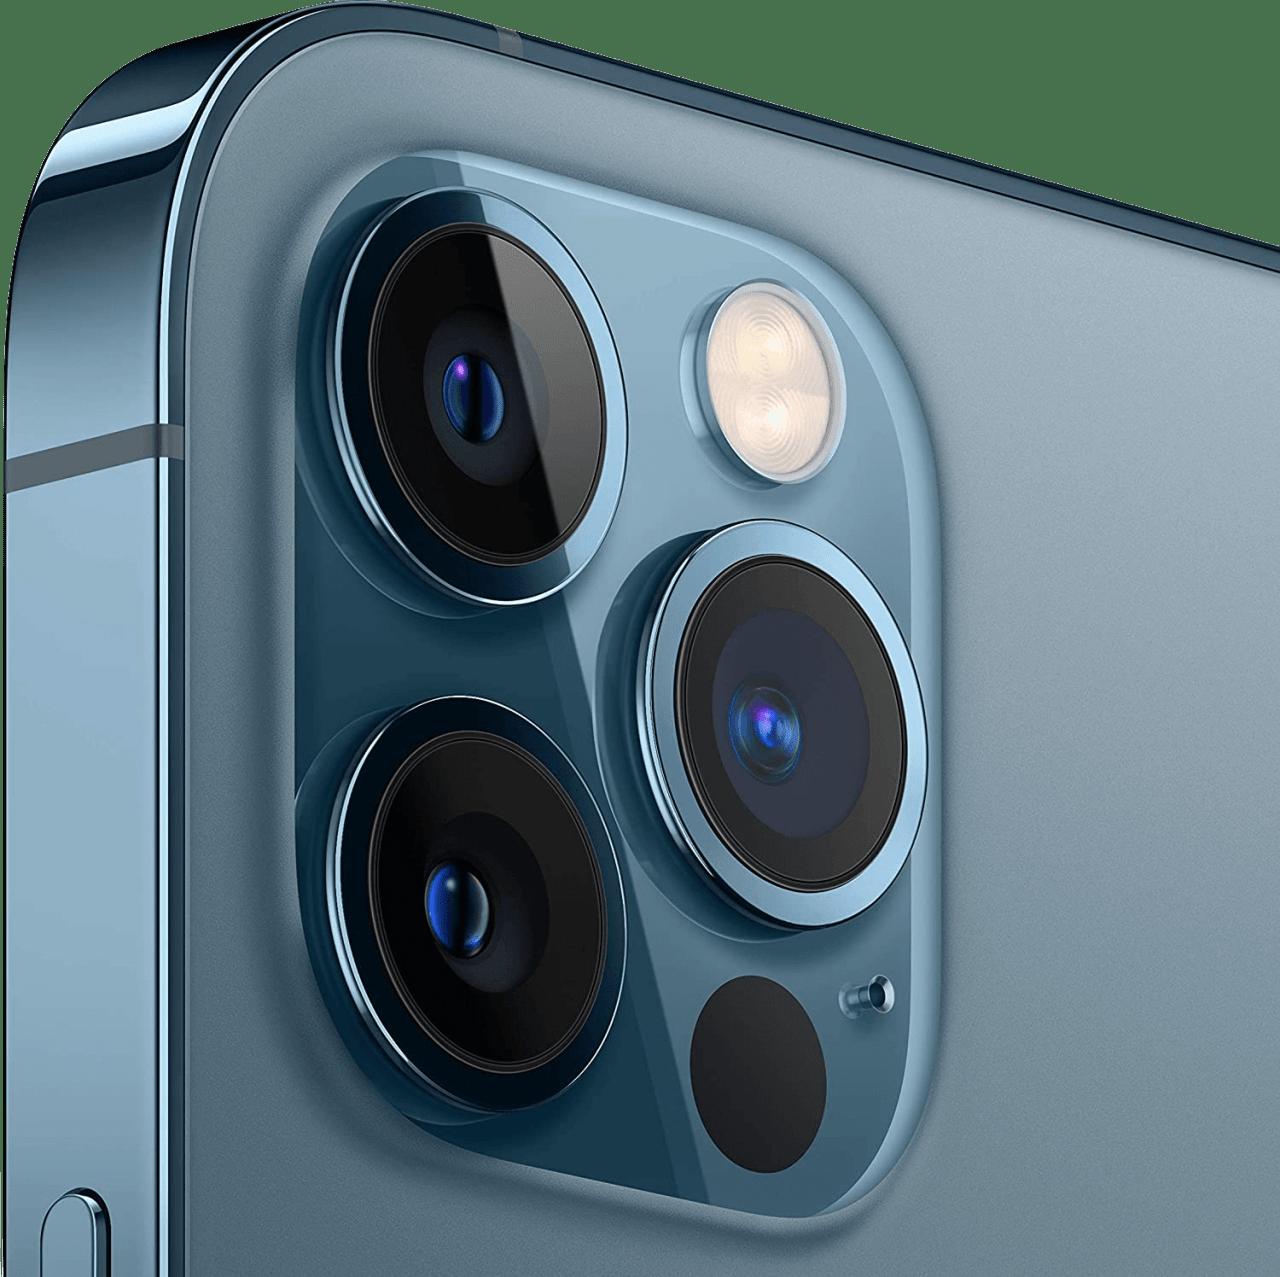 Pacific Blue Apple iPhone 12 Pro Max - 256GB - Dual Sim.4